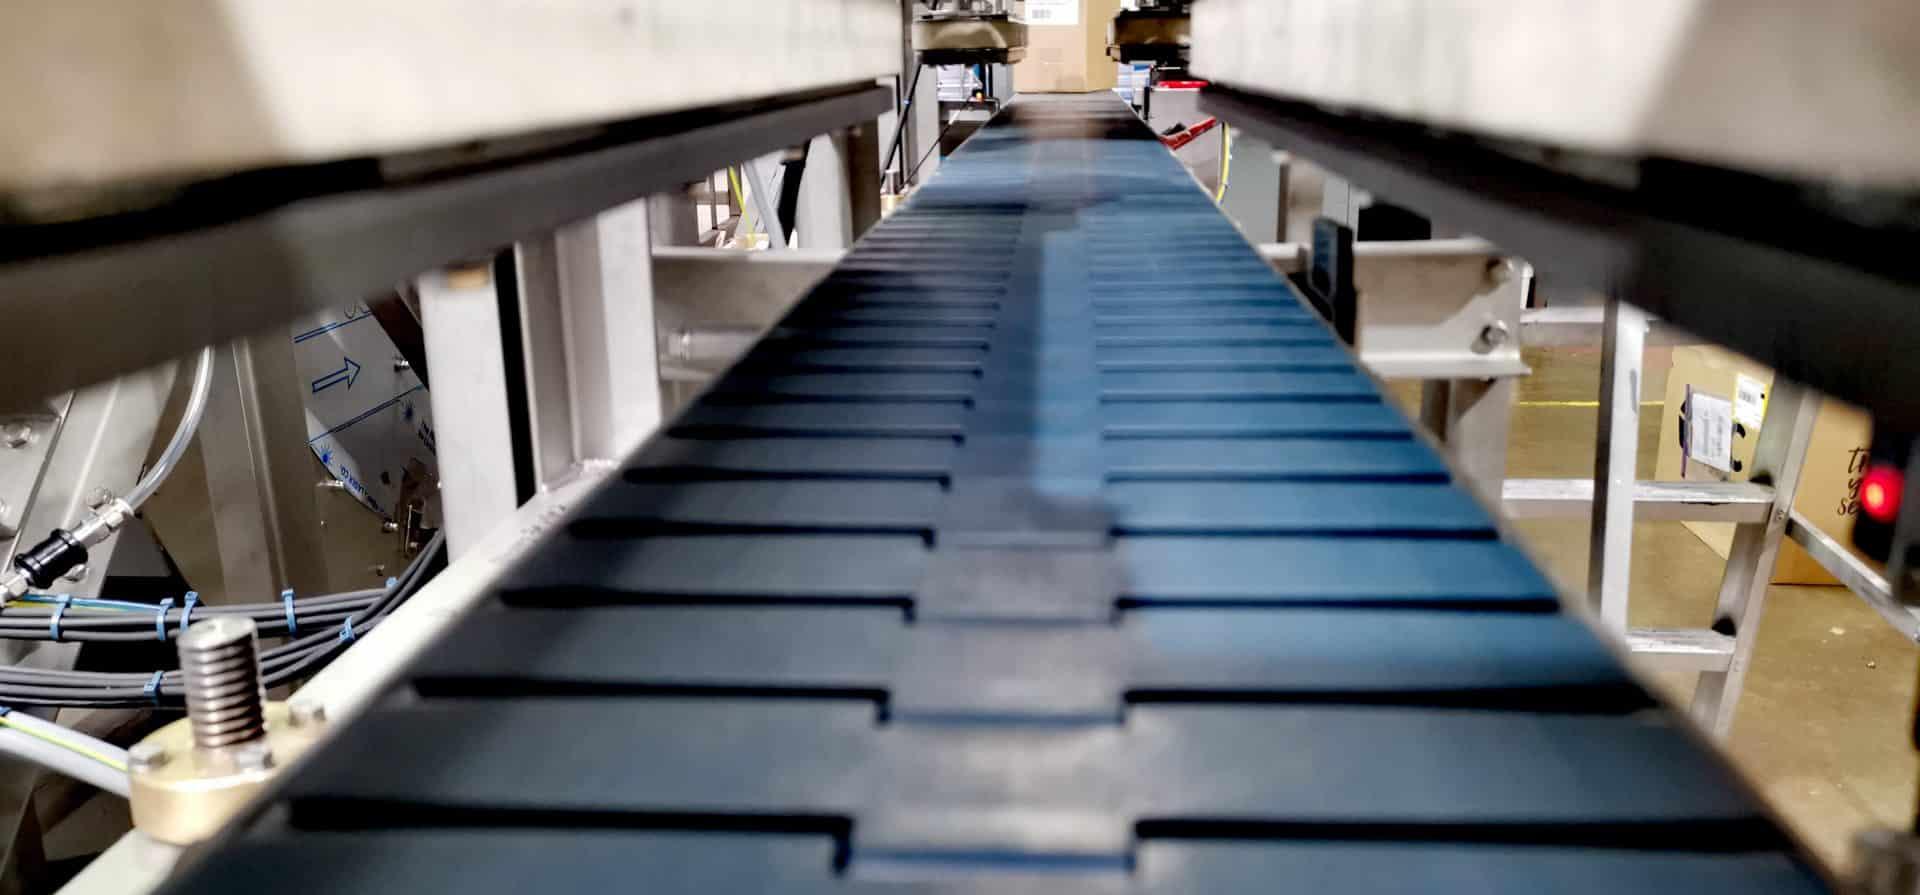 Vibrating Conveyor Systems & Transfer Conveyors | Euroflow Automation Ltd